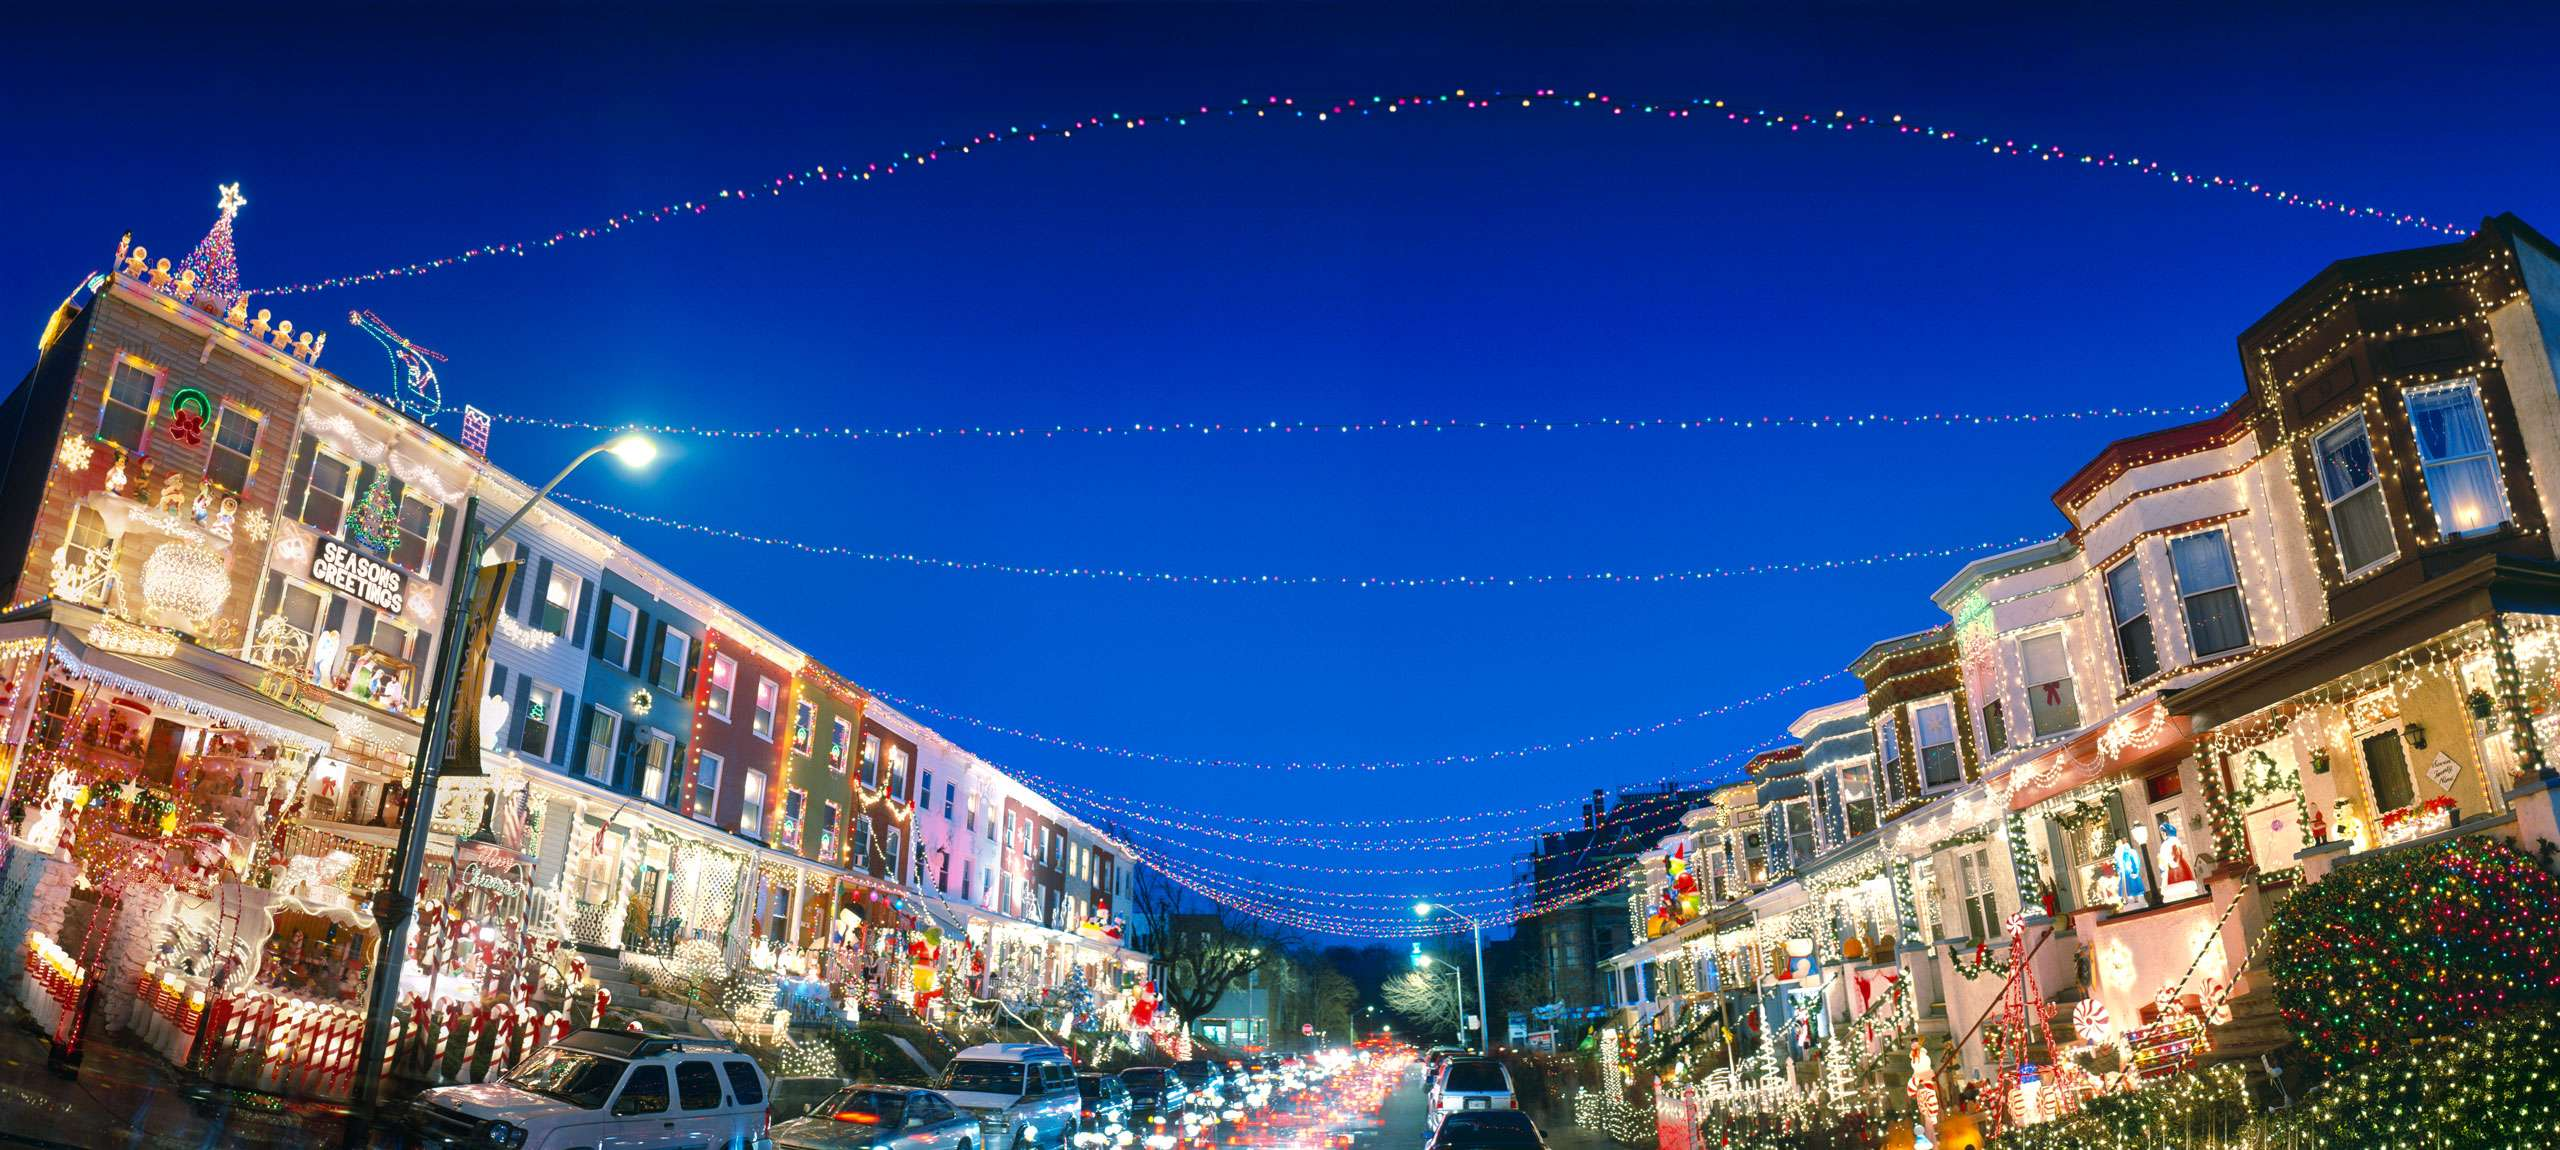 portfolio baltimore neighborhoods 17 houses with christmas decorations 34th street hampden - Baltimore 34th Street Christmas Lights